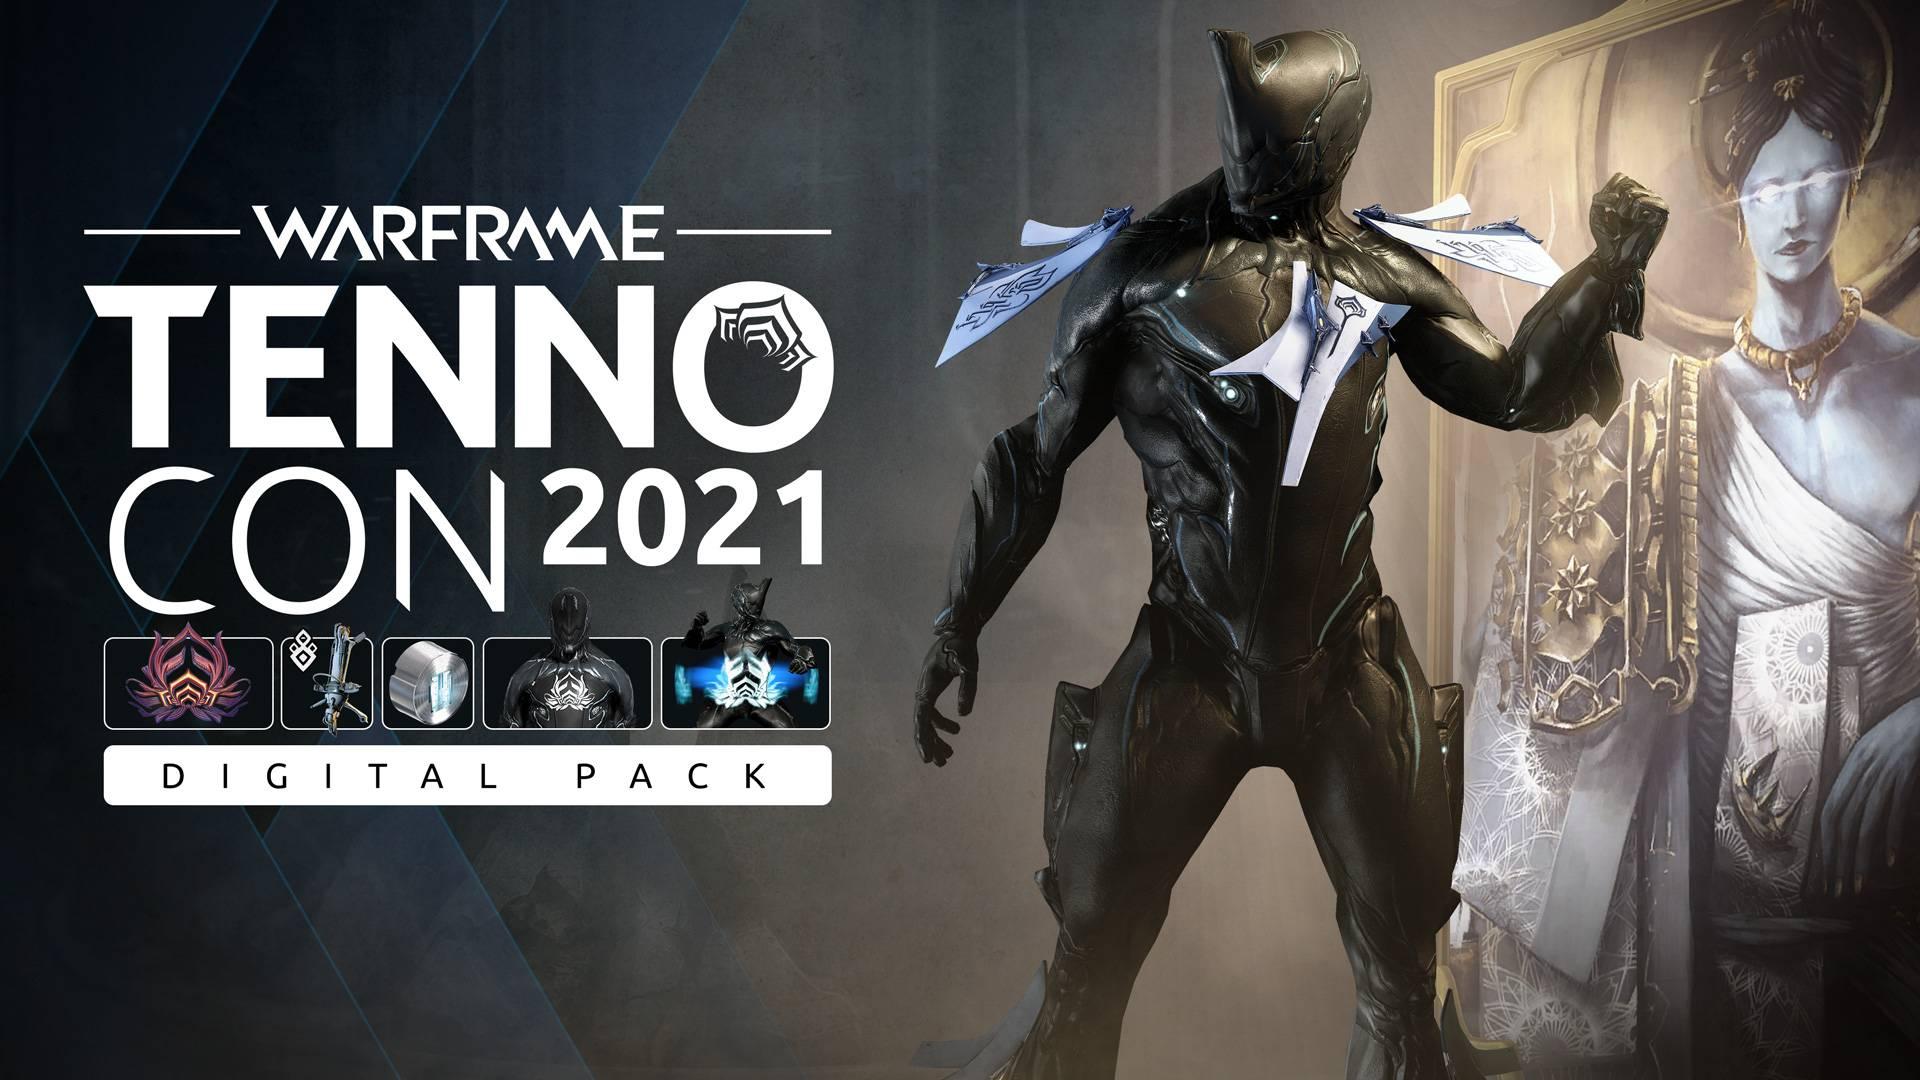 Warframe Tennocon 2021 Digital Pack Oyunpat min-oyunpat